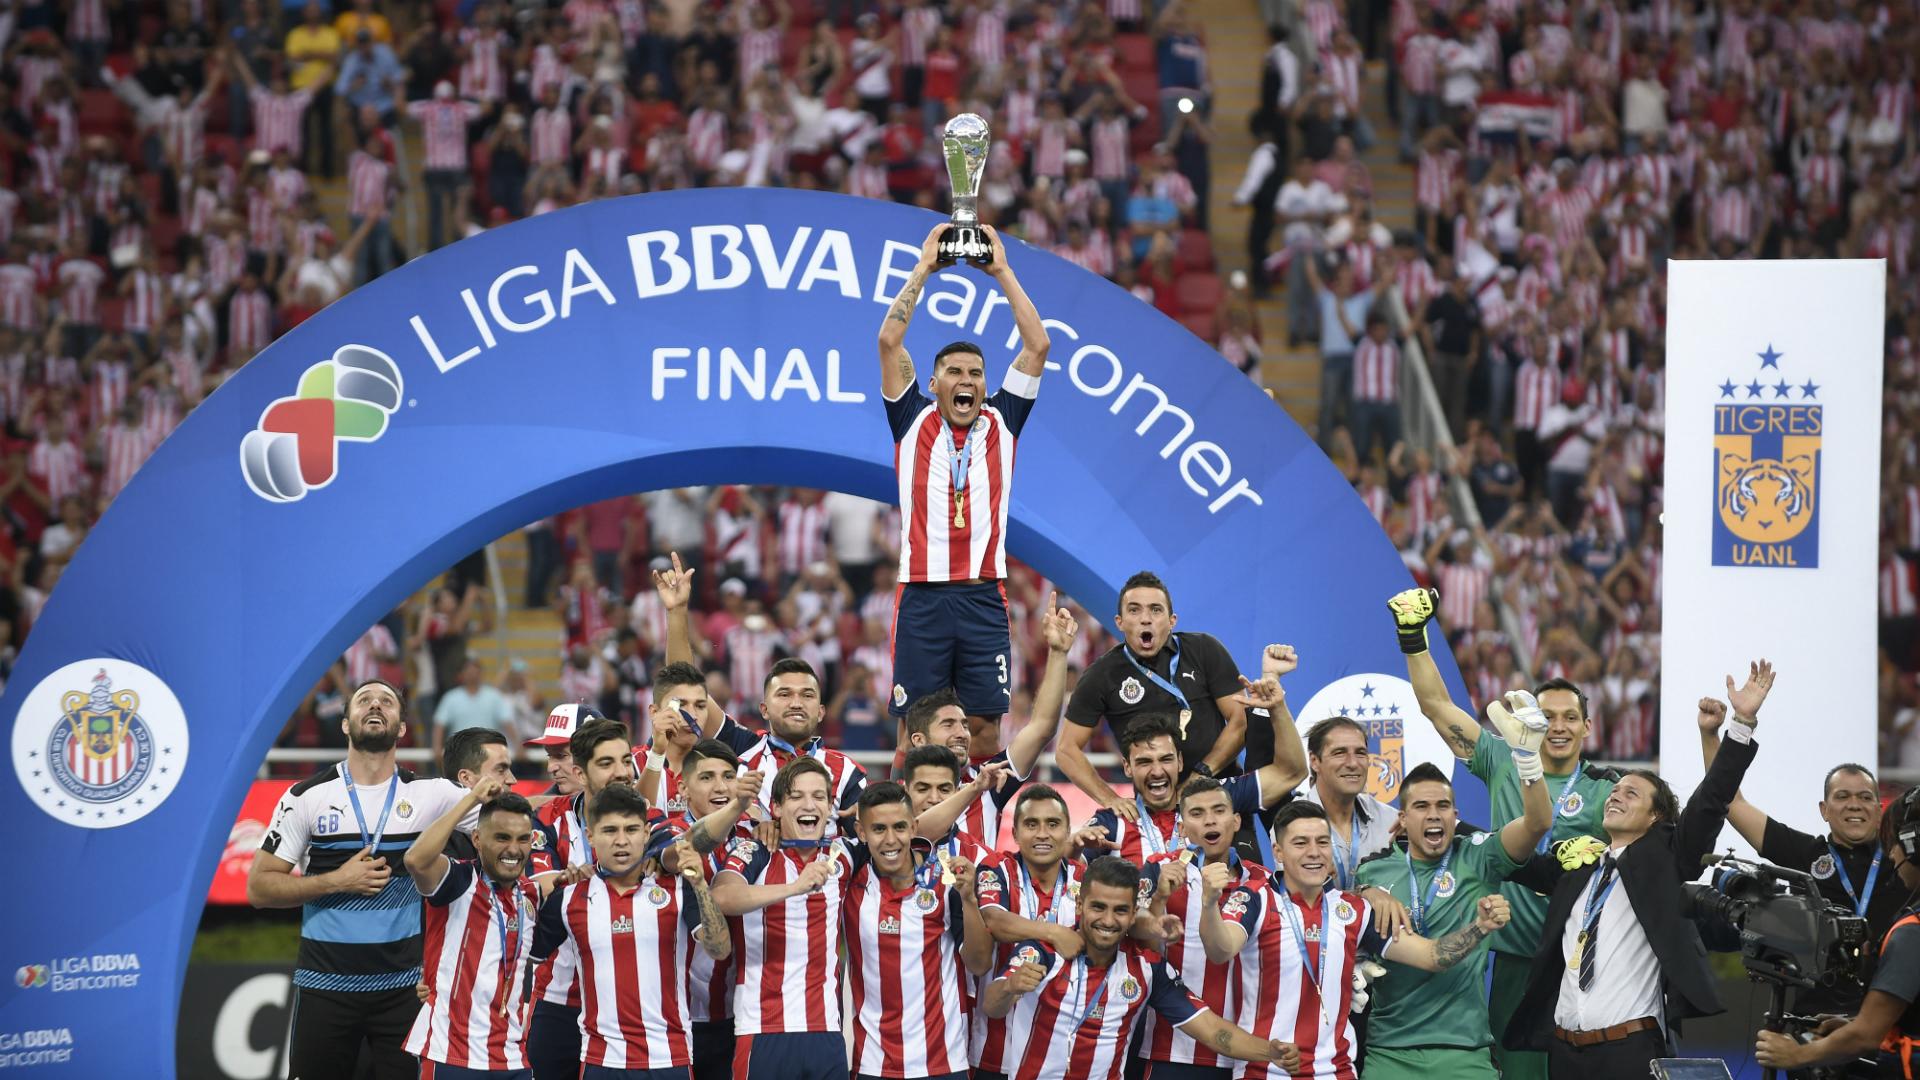 Chivas Campeón